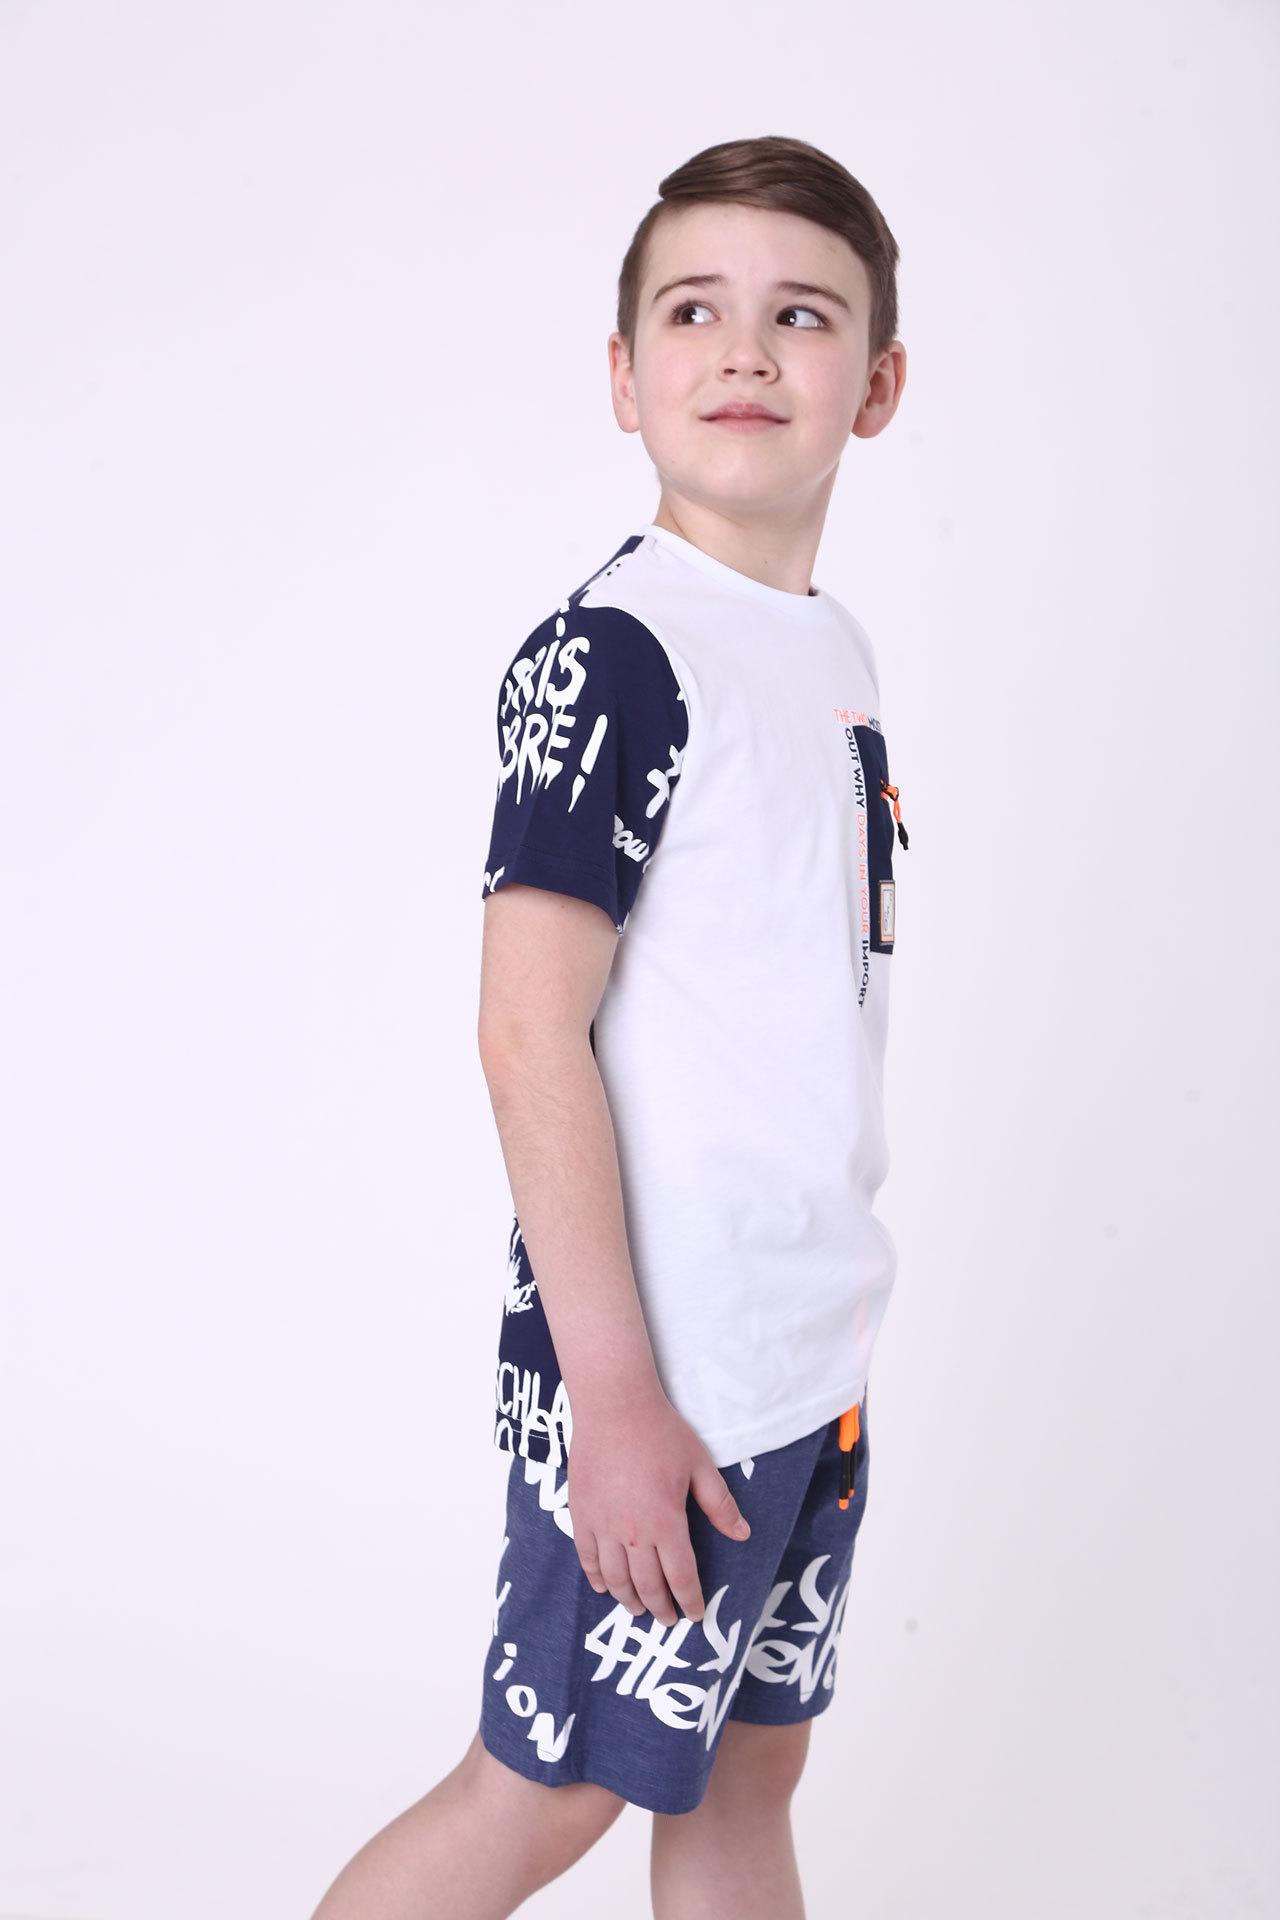 Футболка для мальчика карман Cegisa Турция, 0703 (116-134)